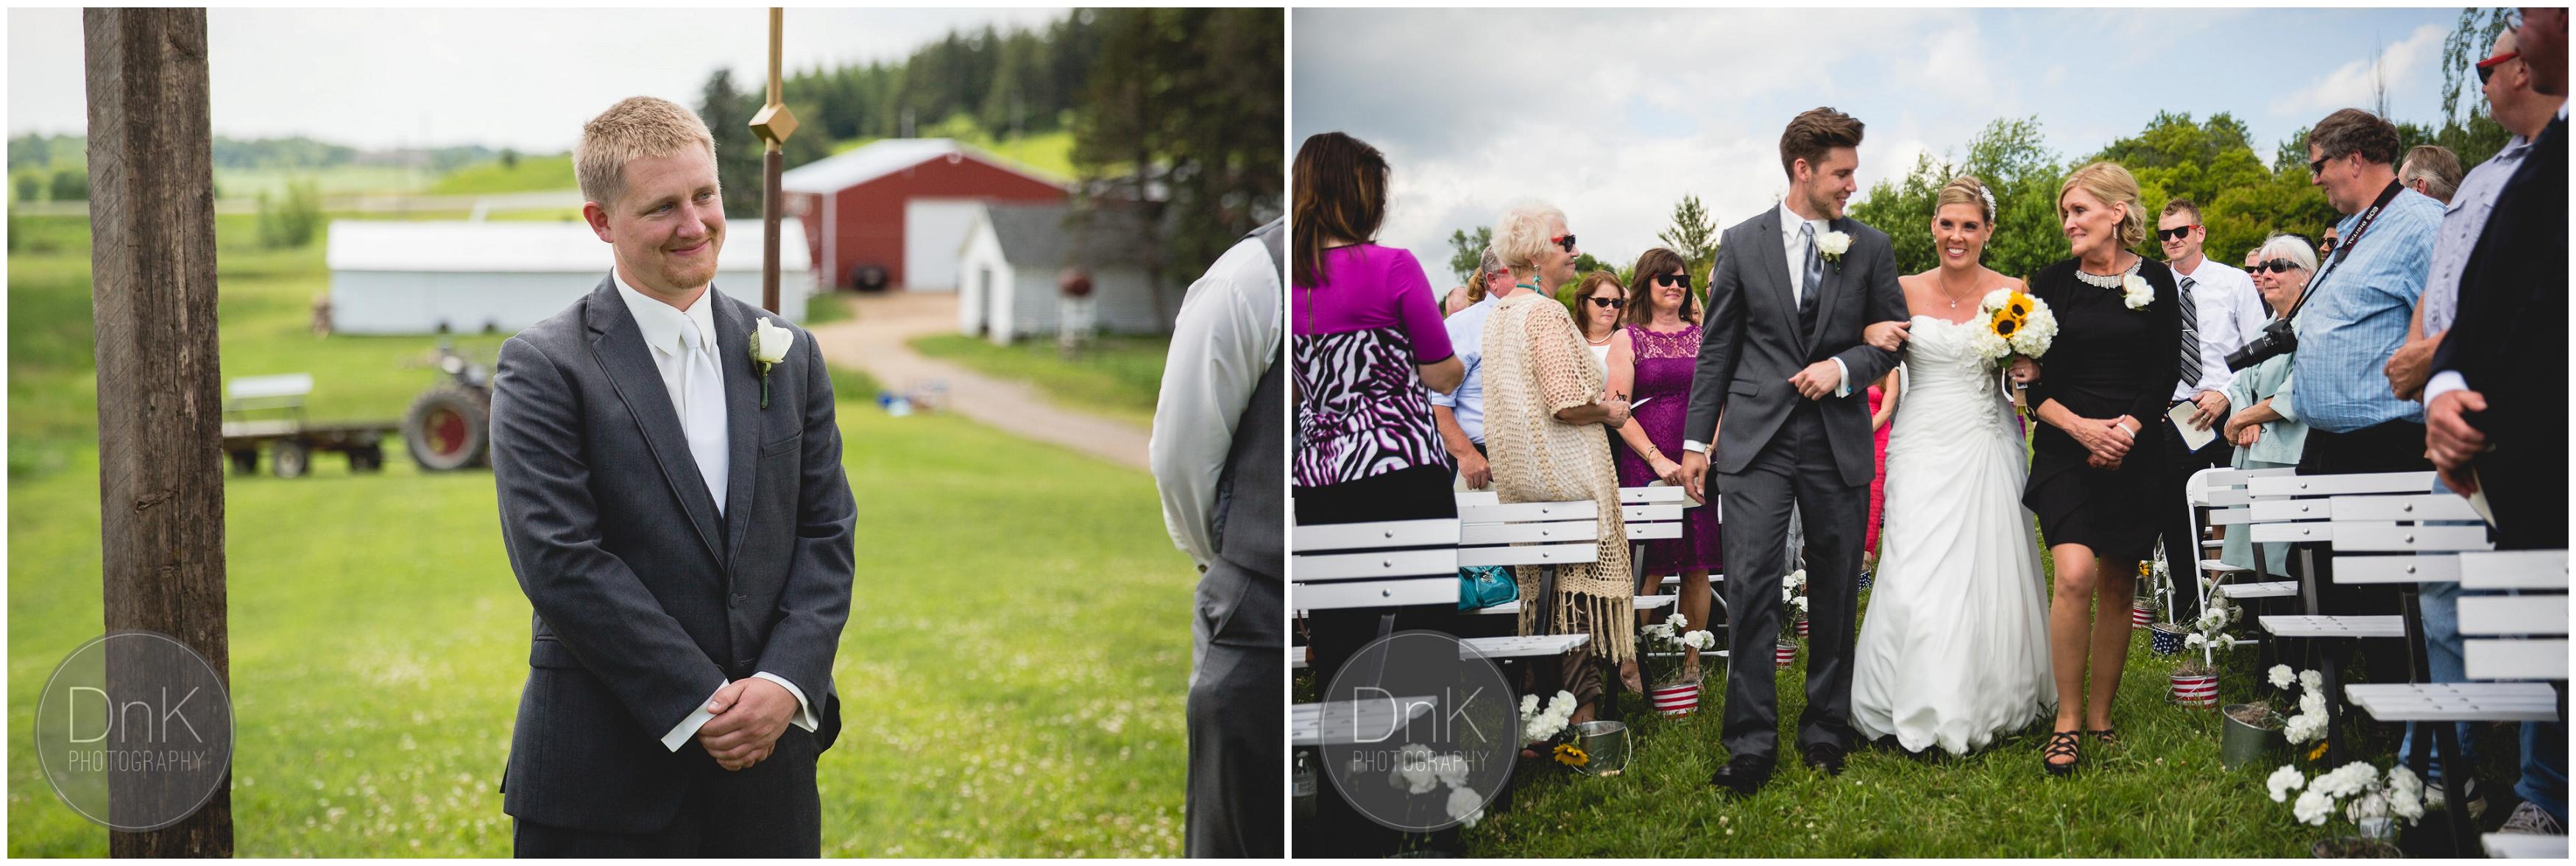 18- Outdoor Wedding Ceremony Dellwood Barn